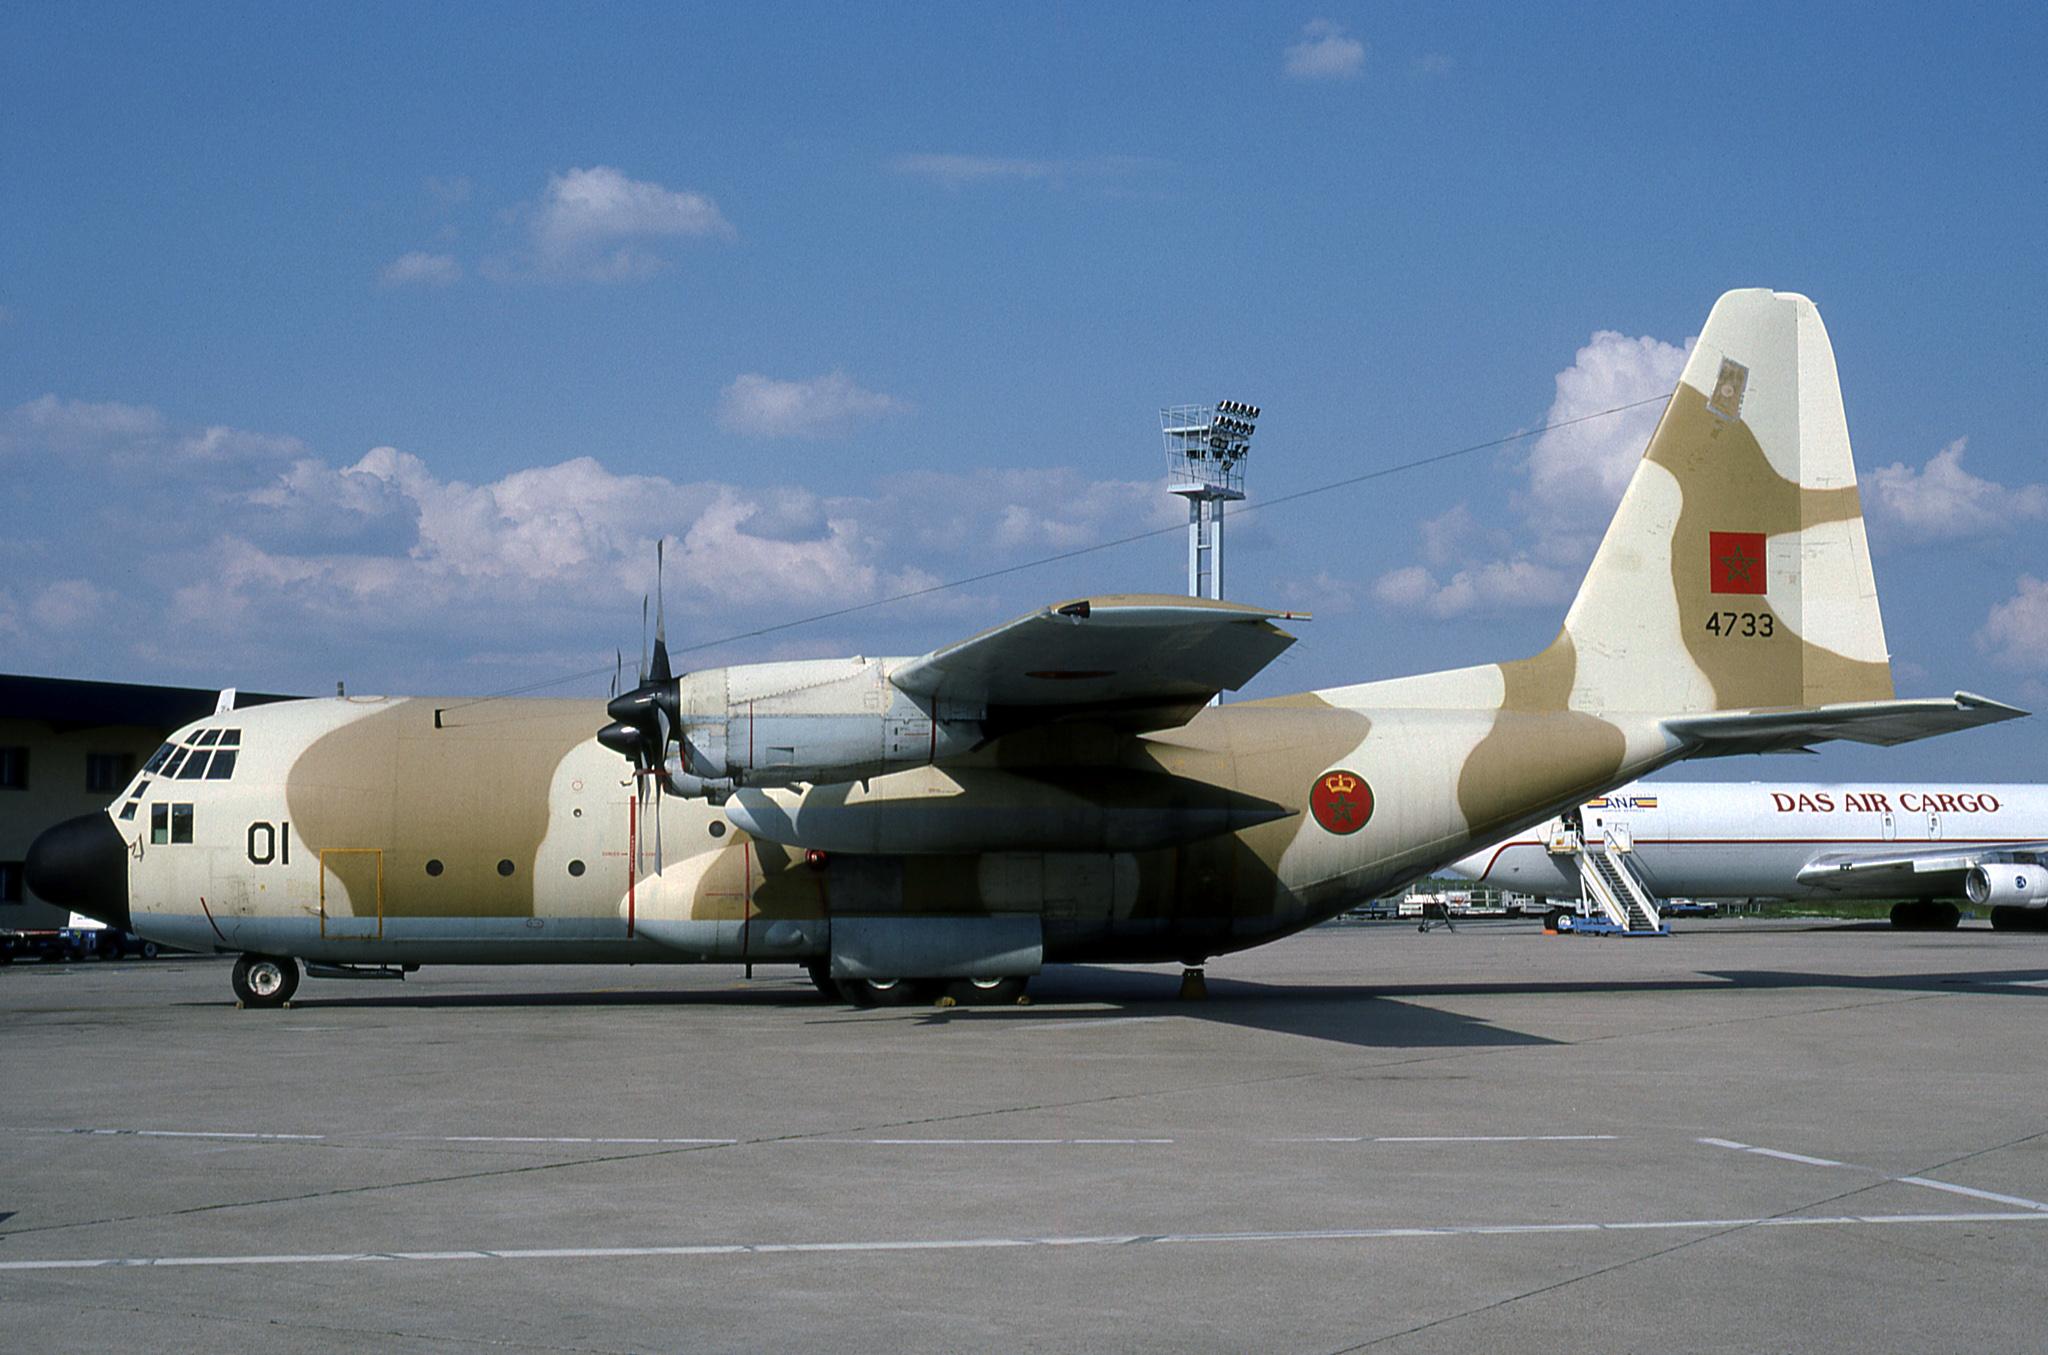 FRA: Photos d'avions de transport - Page 38 48463314536_c91a3882ba_o